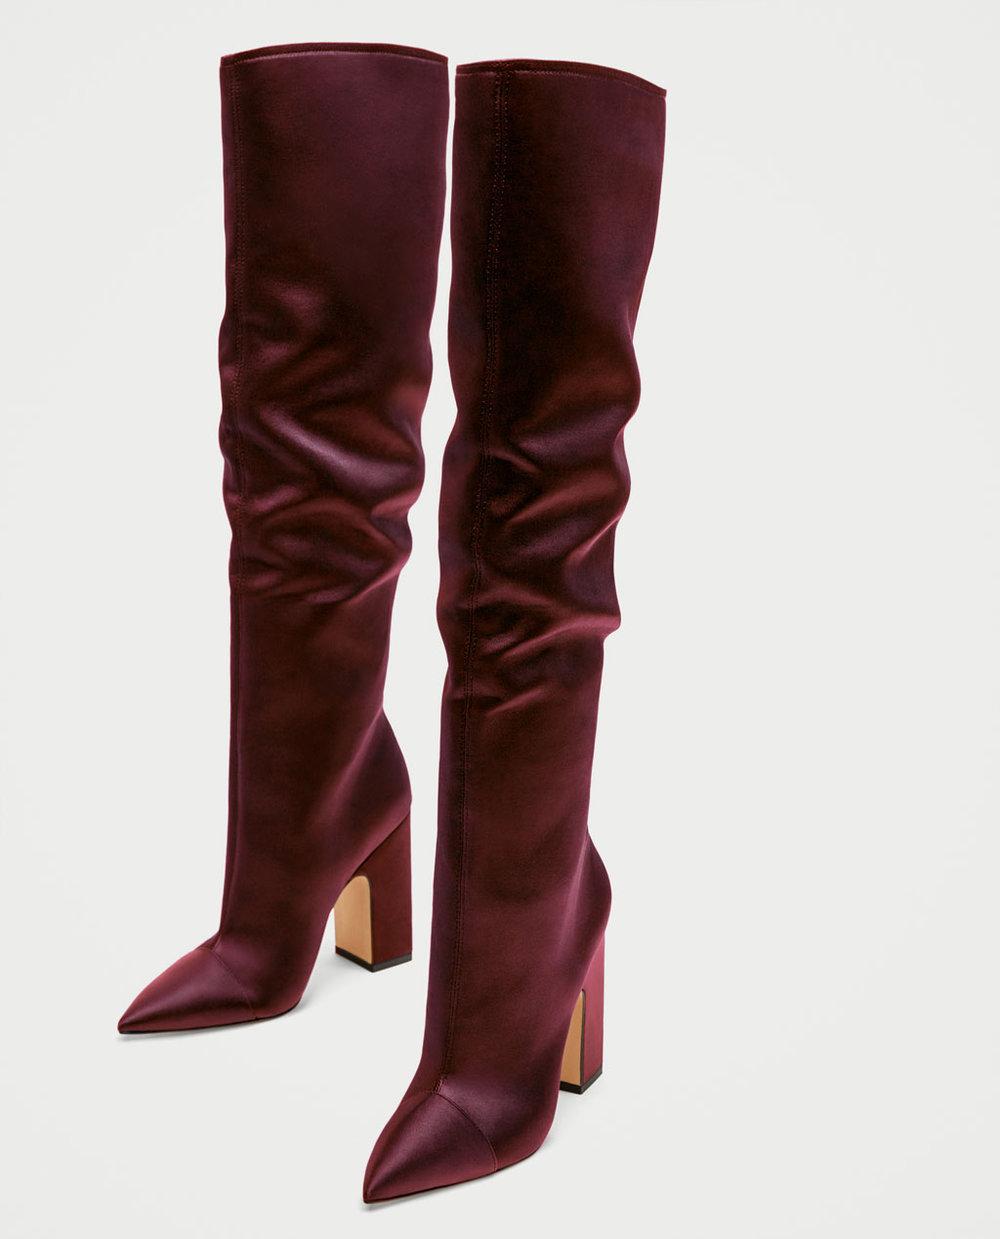 DFWM boots, pure icing Sateen High Heel / $99 / Zara